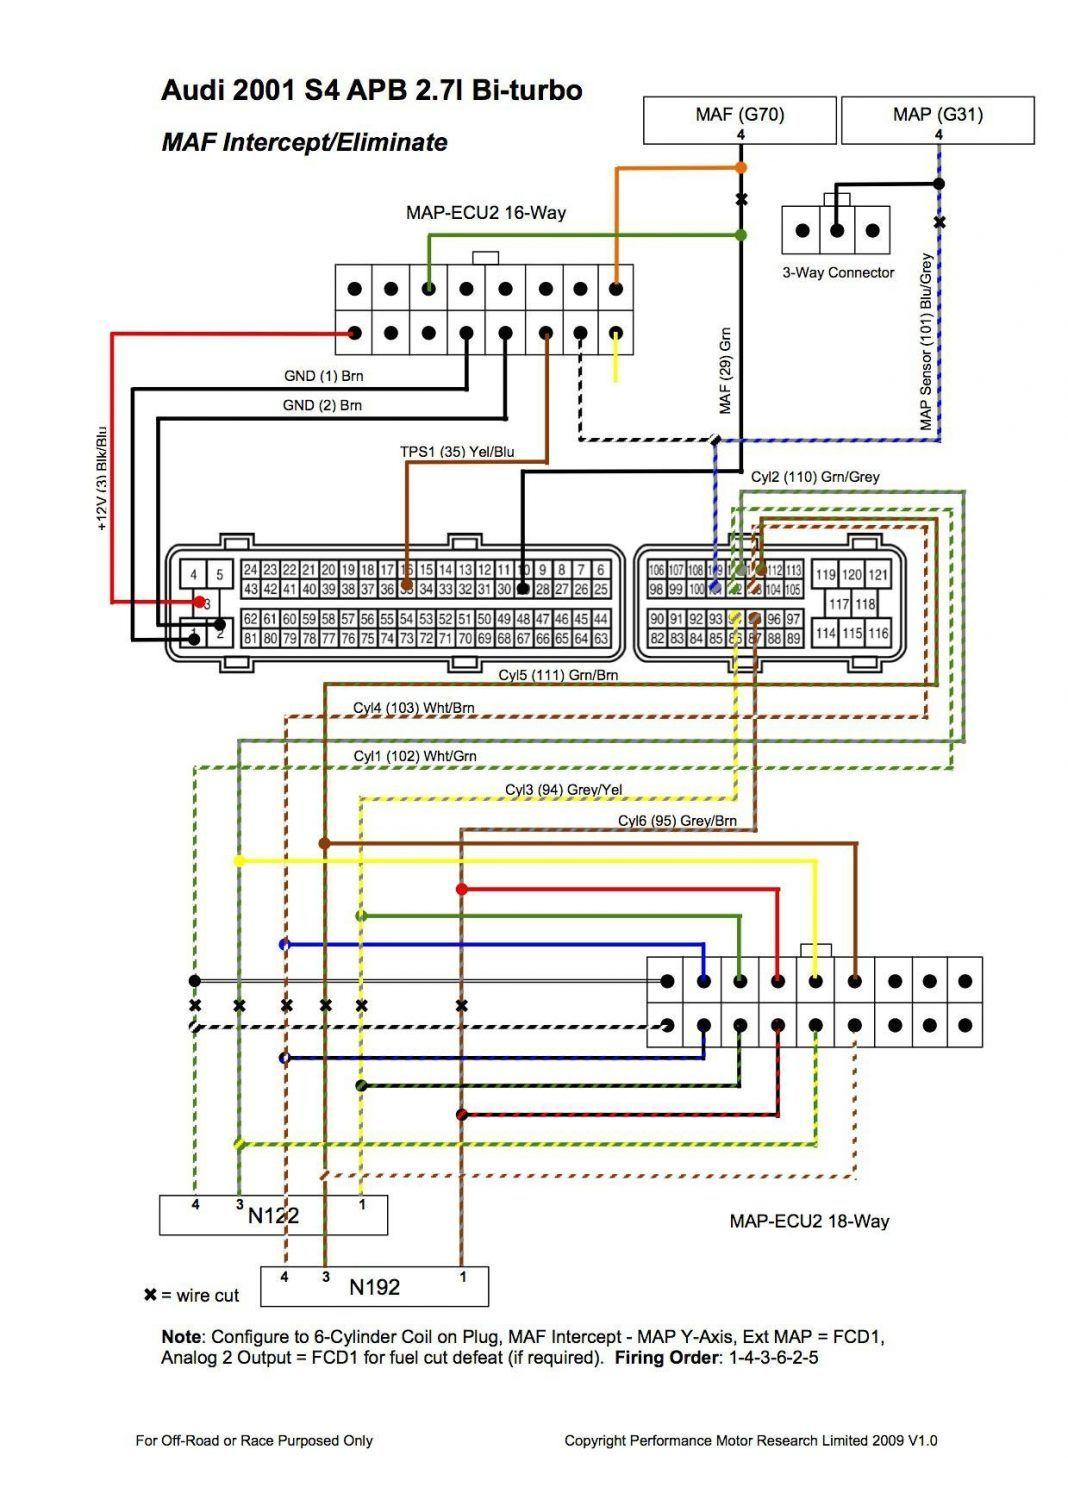 1996 Dodge Ram 1500 Dash : dodge, Complex, Wiring, Diagram, Online, Bacamajalah, Diagram,, Toyota,, Trailer